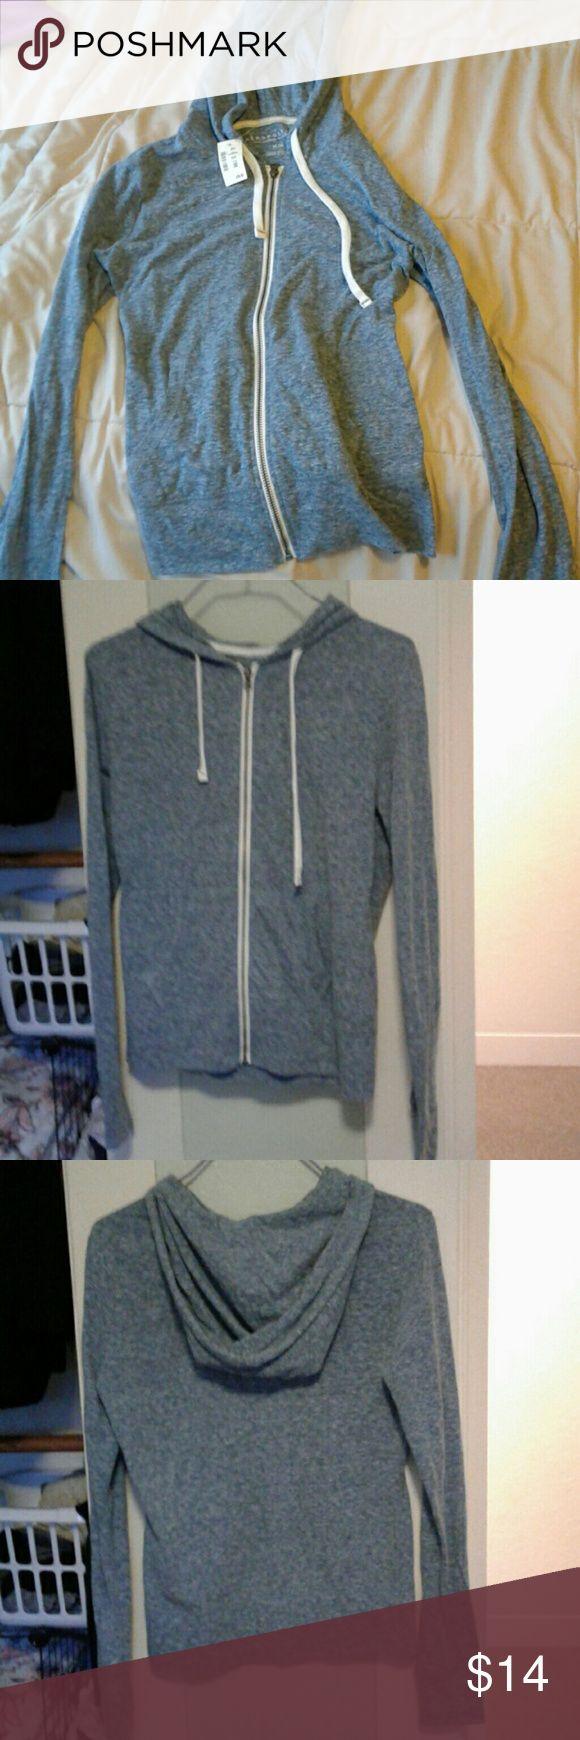 Super cute Aeropostale hoodie! Bluish grey, lightweight, thin hoodie. Great condition, still has tags. Medium, zip up with white drawstrings. Aeropostale Tops Sweatshirts & Hoodies